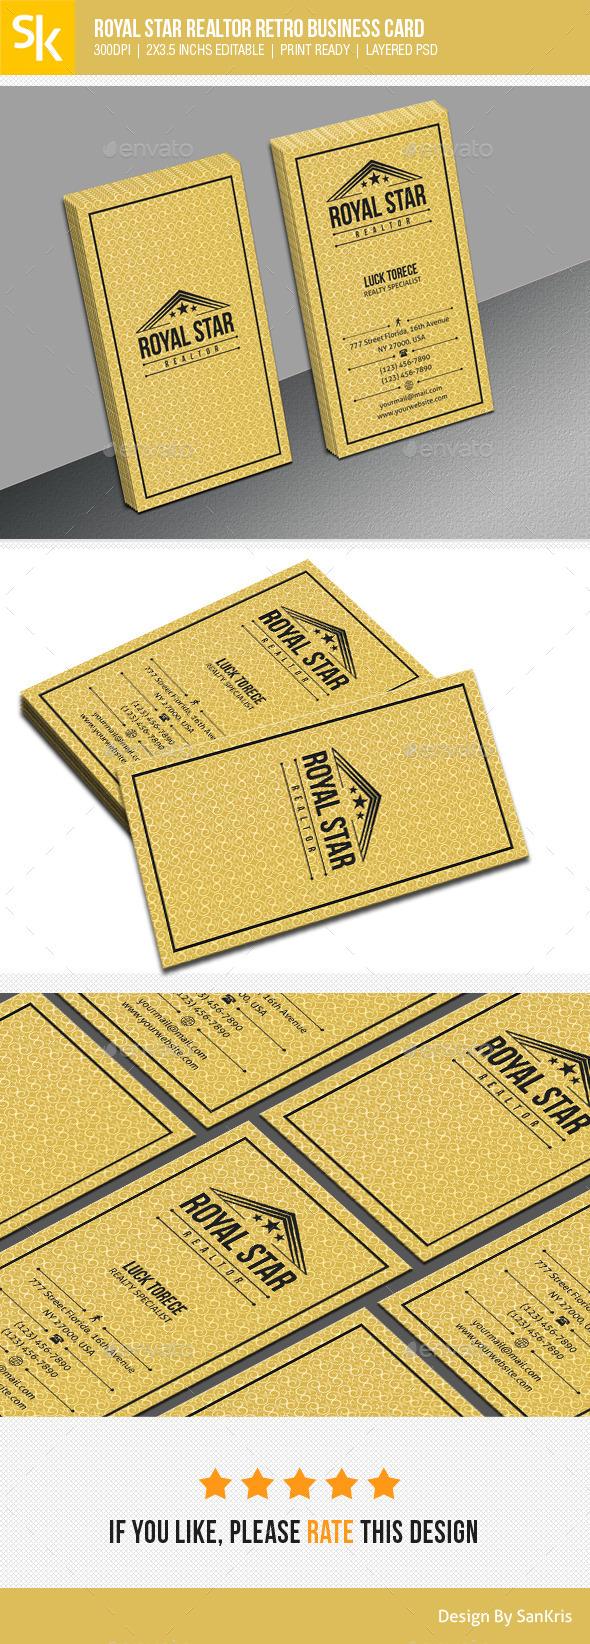 Royal Star Realtor Retro Business Card - Retro/Vintage Business Cards